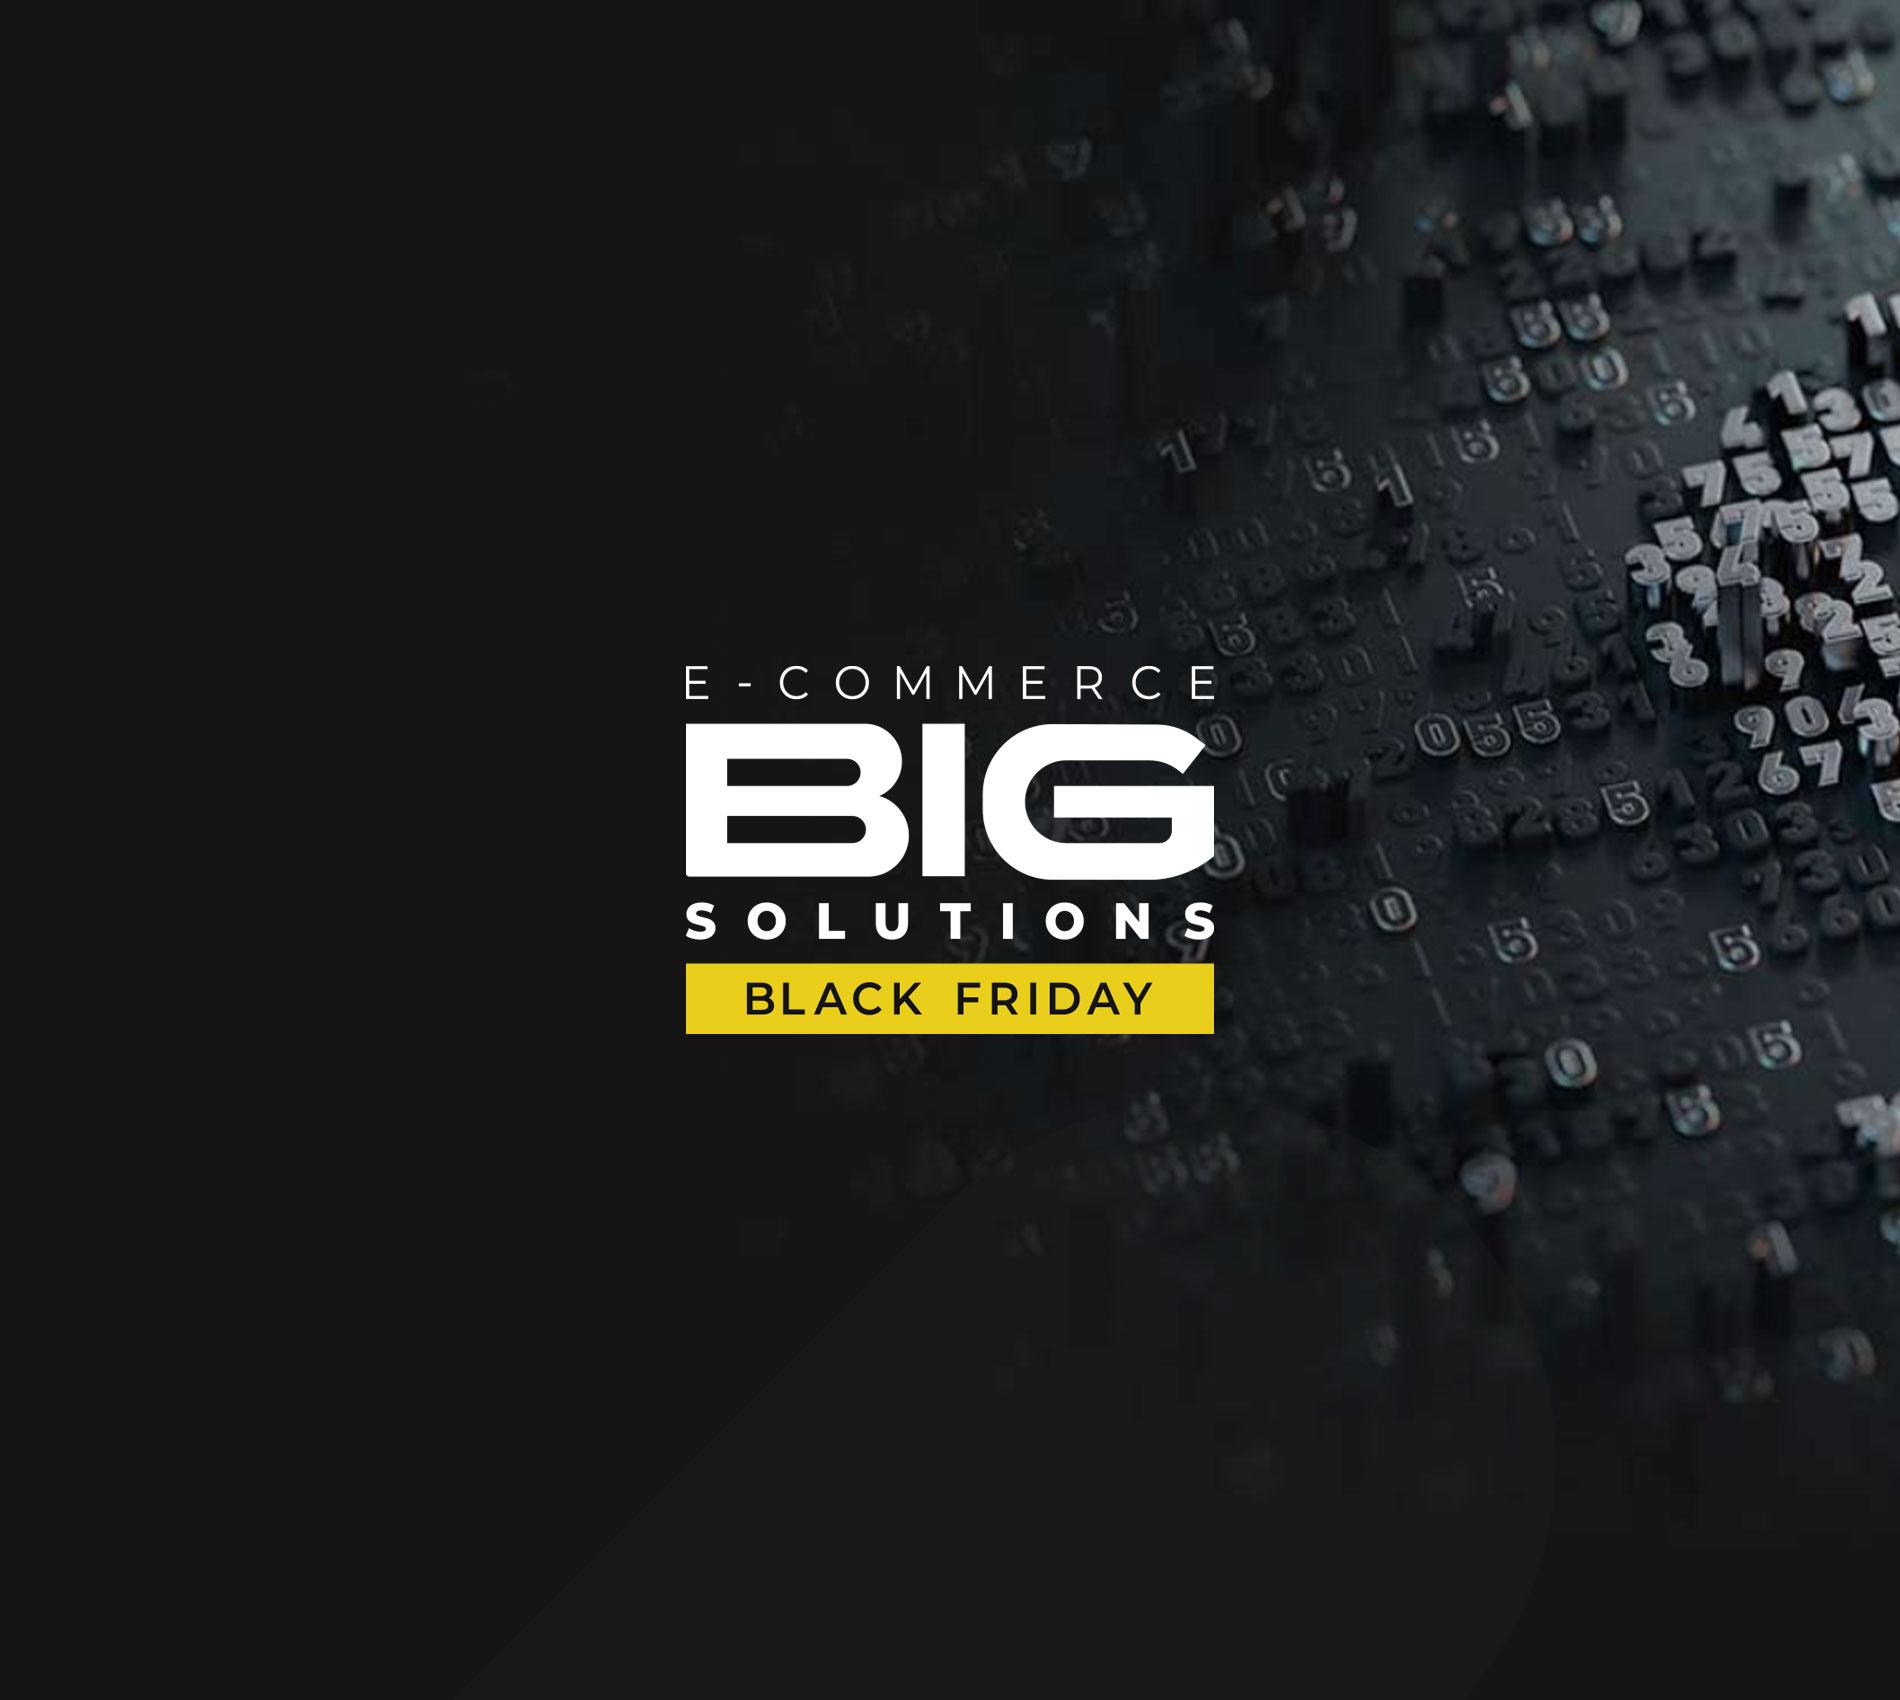 E-commerce Big Solutions – Black Friday, 2021